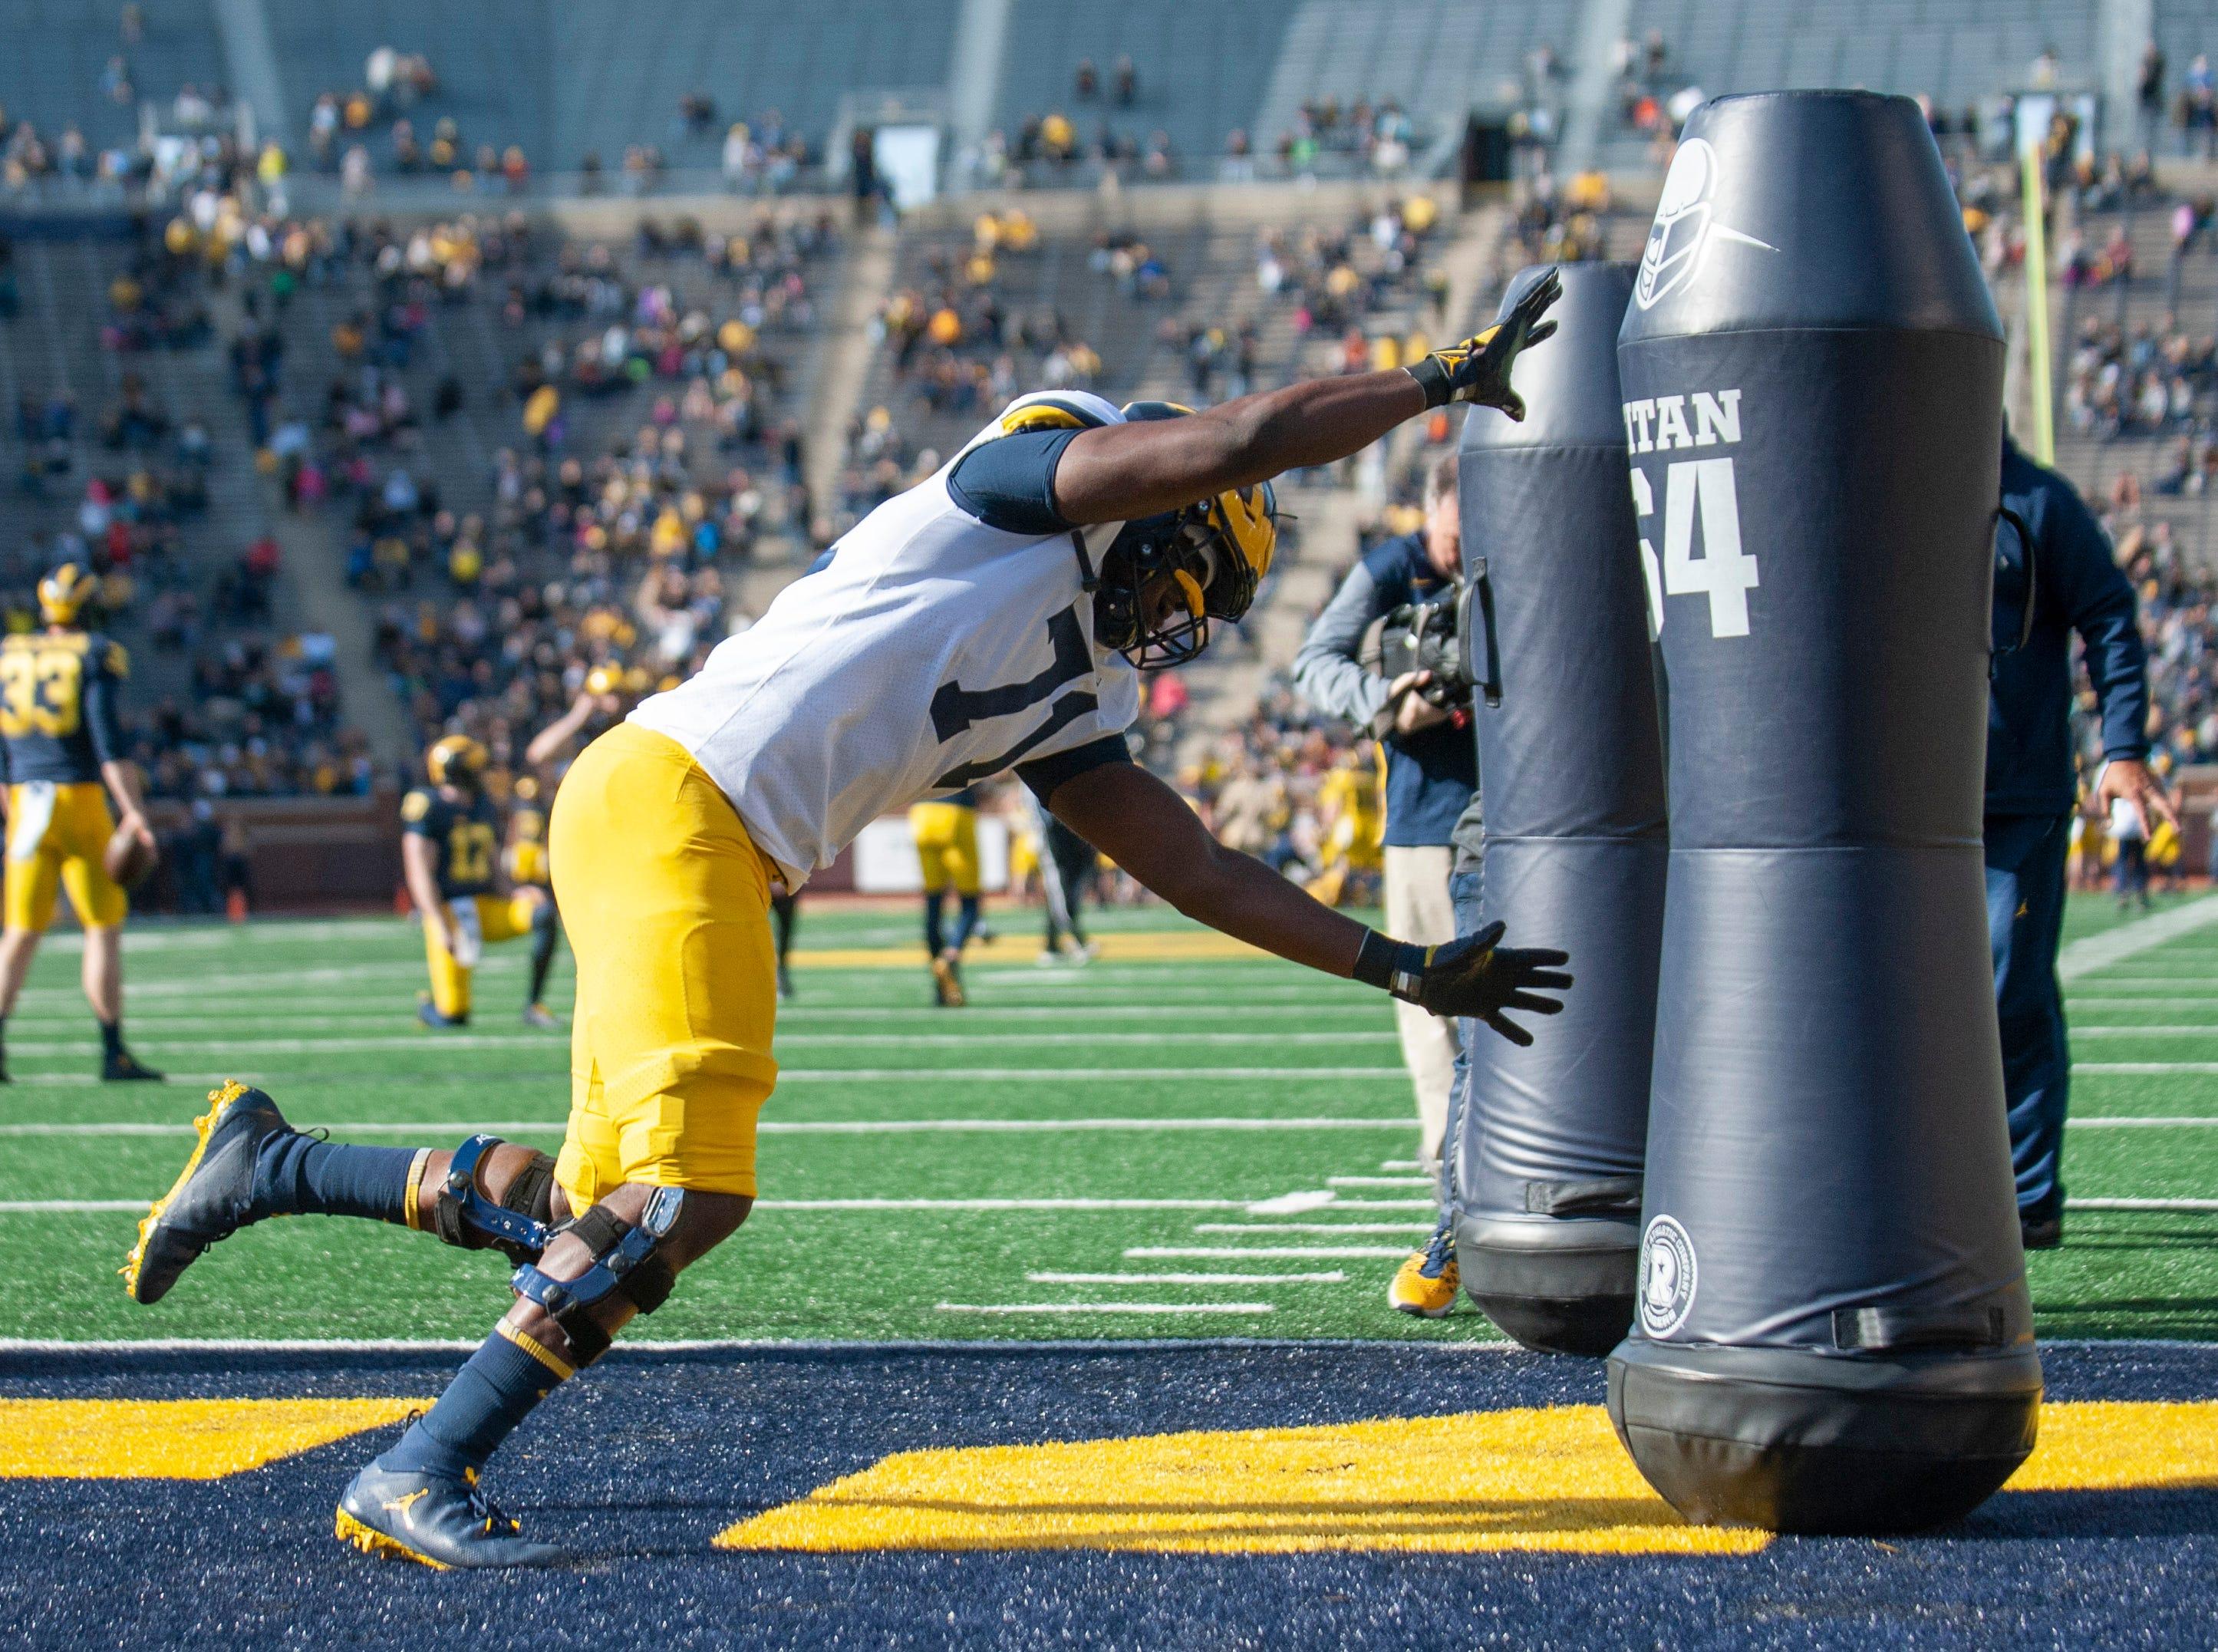 Michigan freshman defensive lineman David Ojabo attacks a series of tackling dummies during a drill.